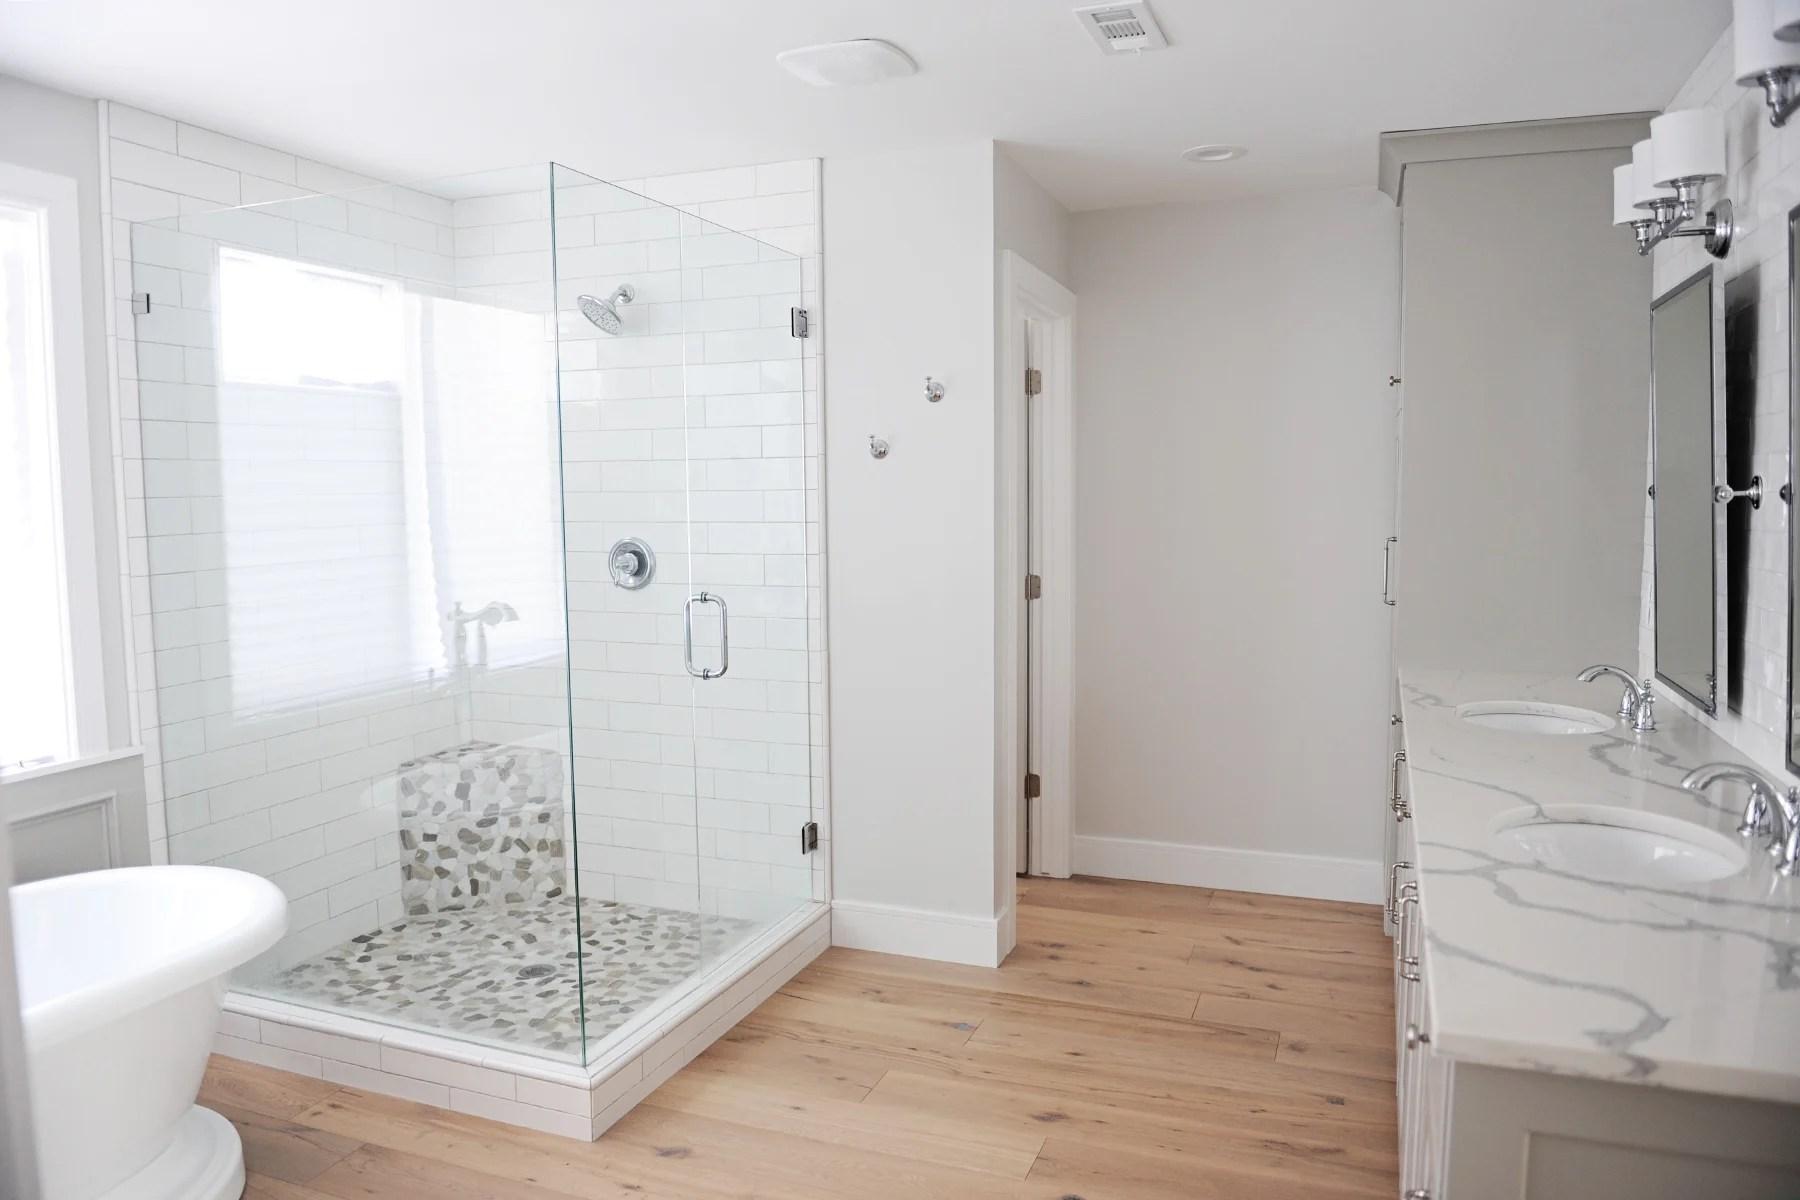 Master Bathroom Remodel & Renovation Idea: Before and After on Master Bathroom Remodel Ideas  id=51074